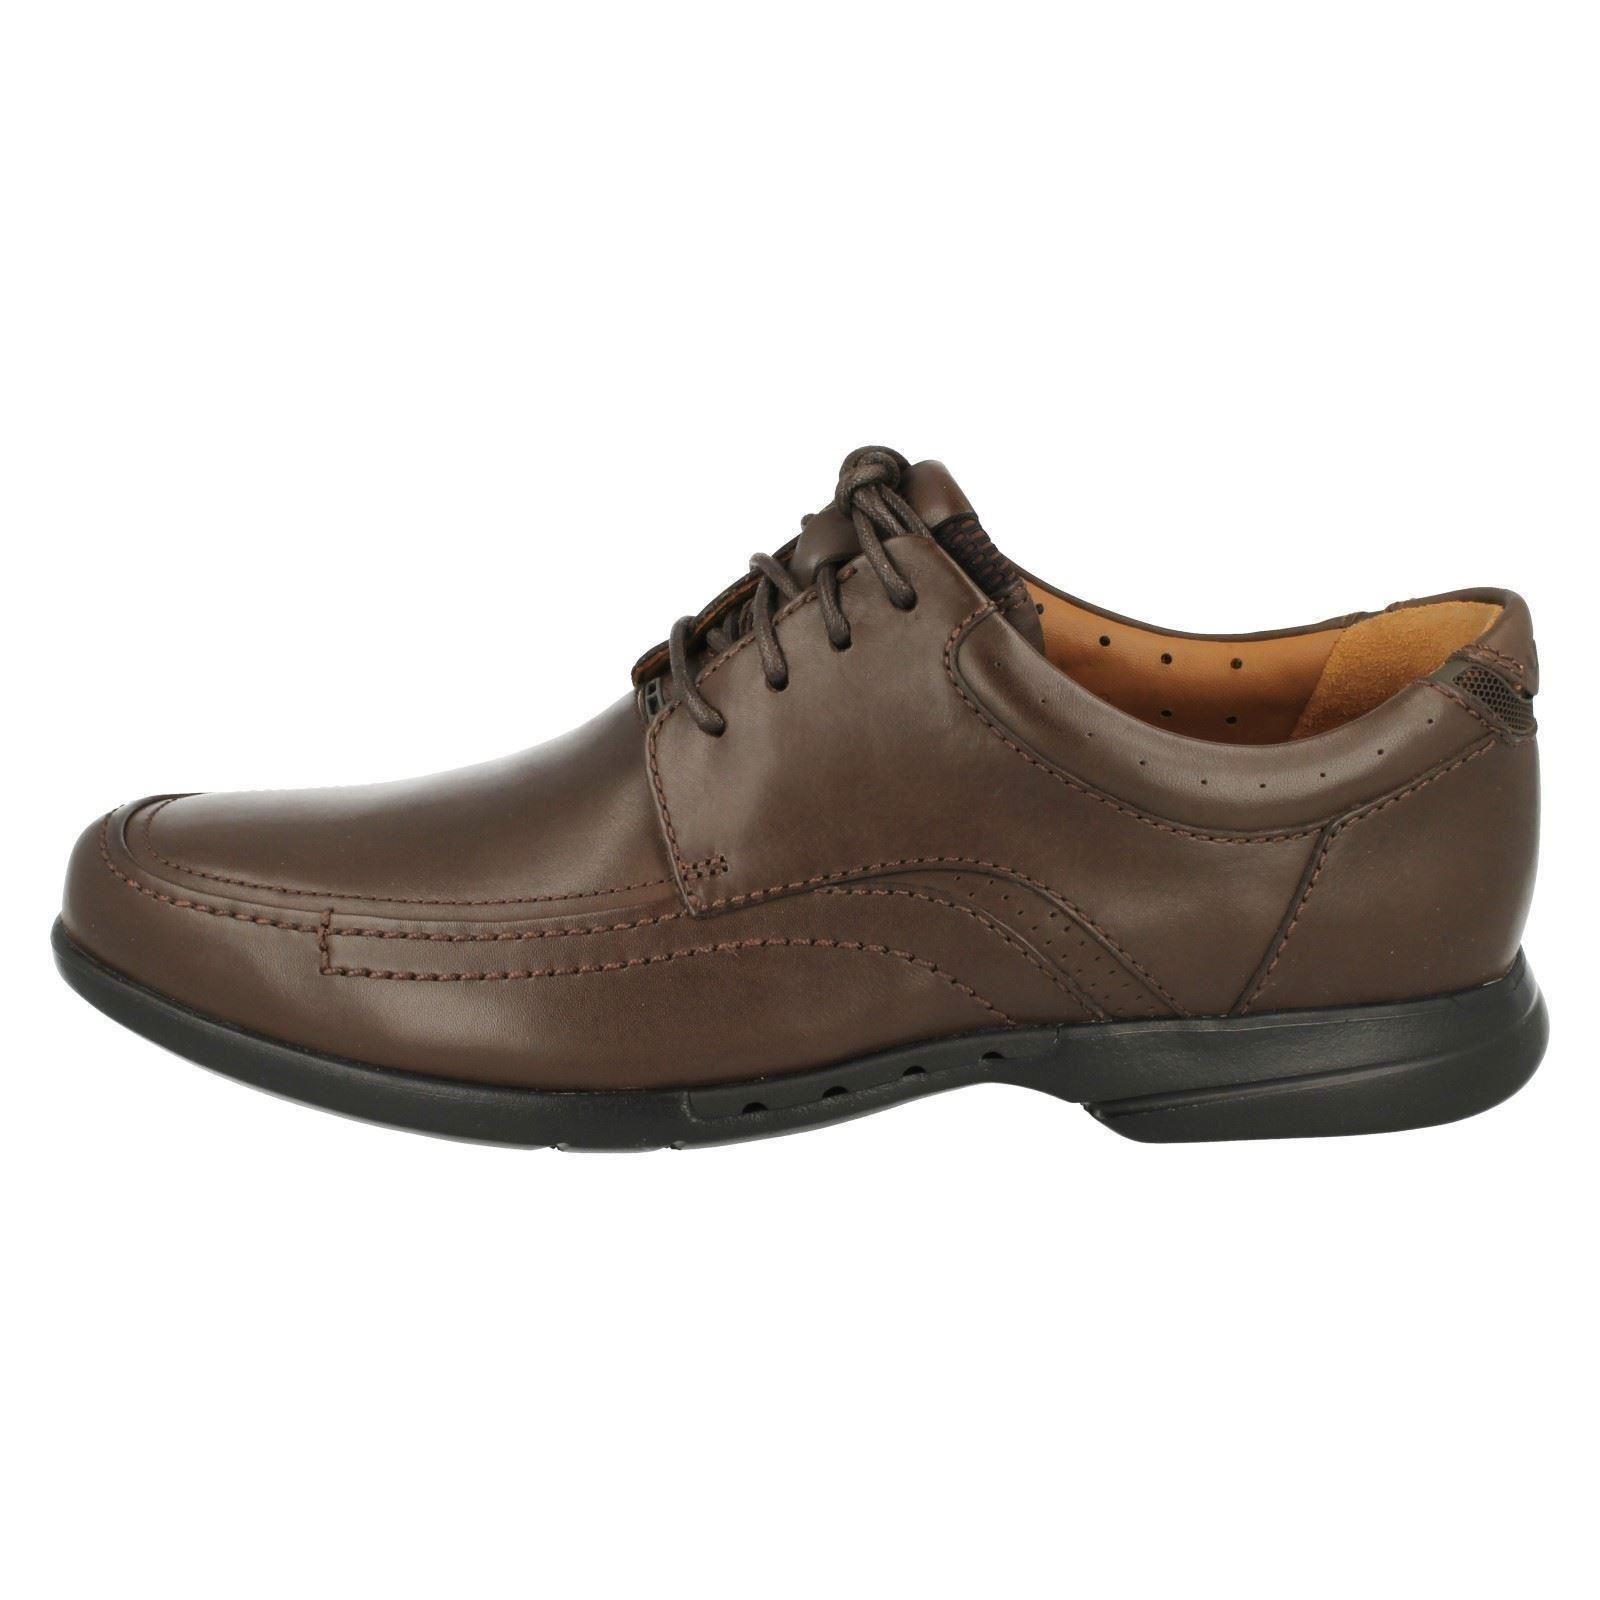 Un con marrón hombre en Clarks Sanford oscuro para marrón cordones Zapatos fA6w5qF